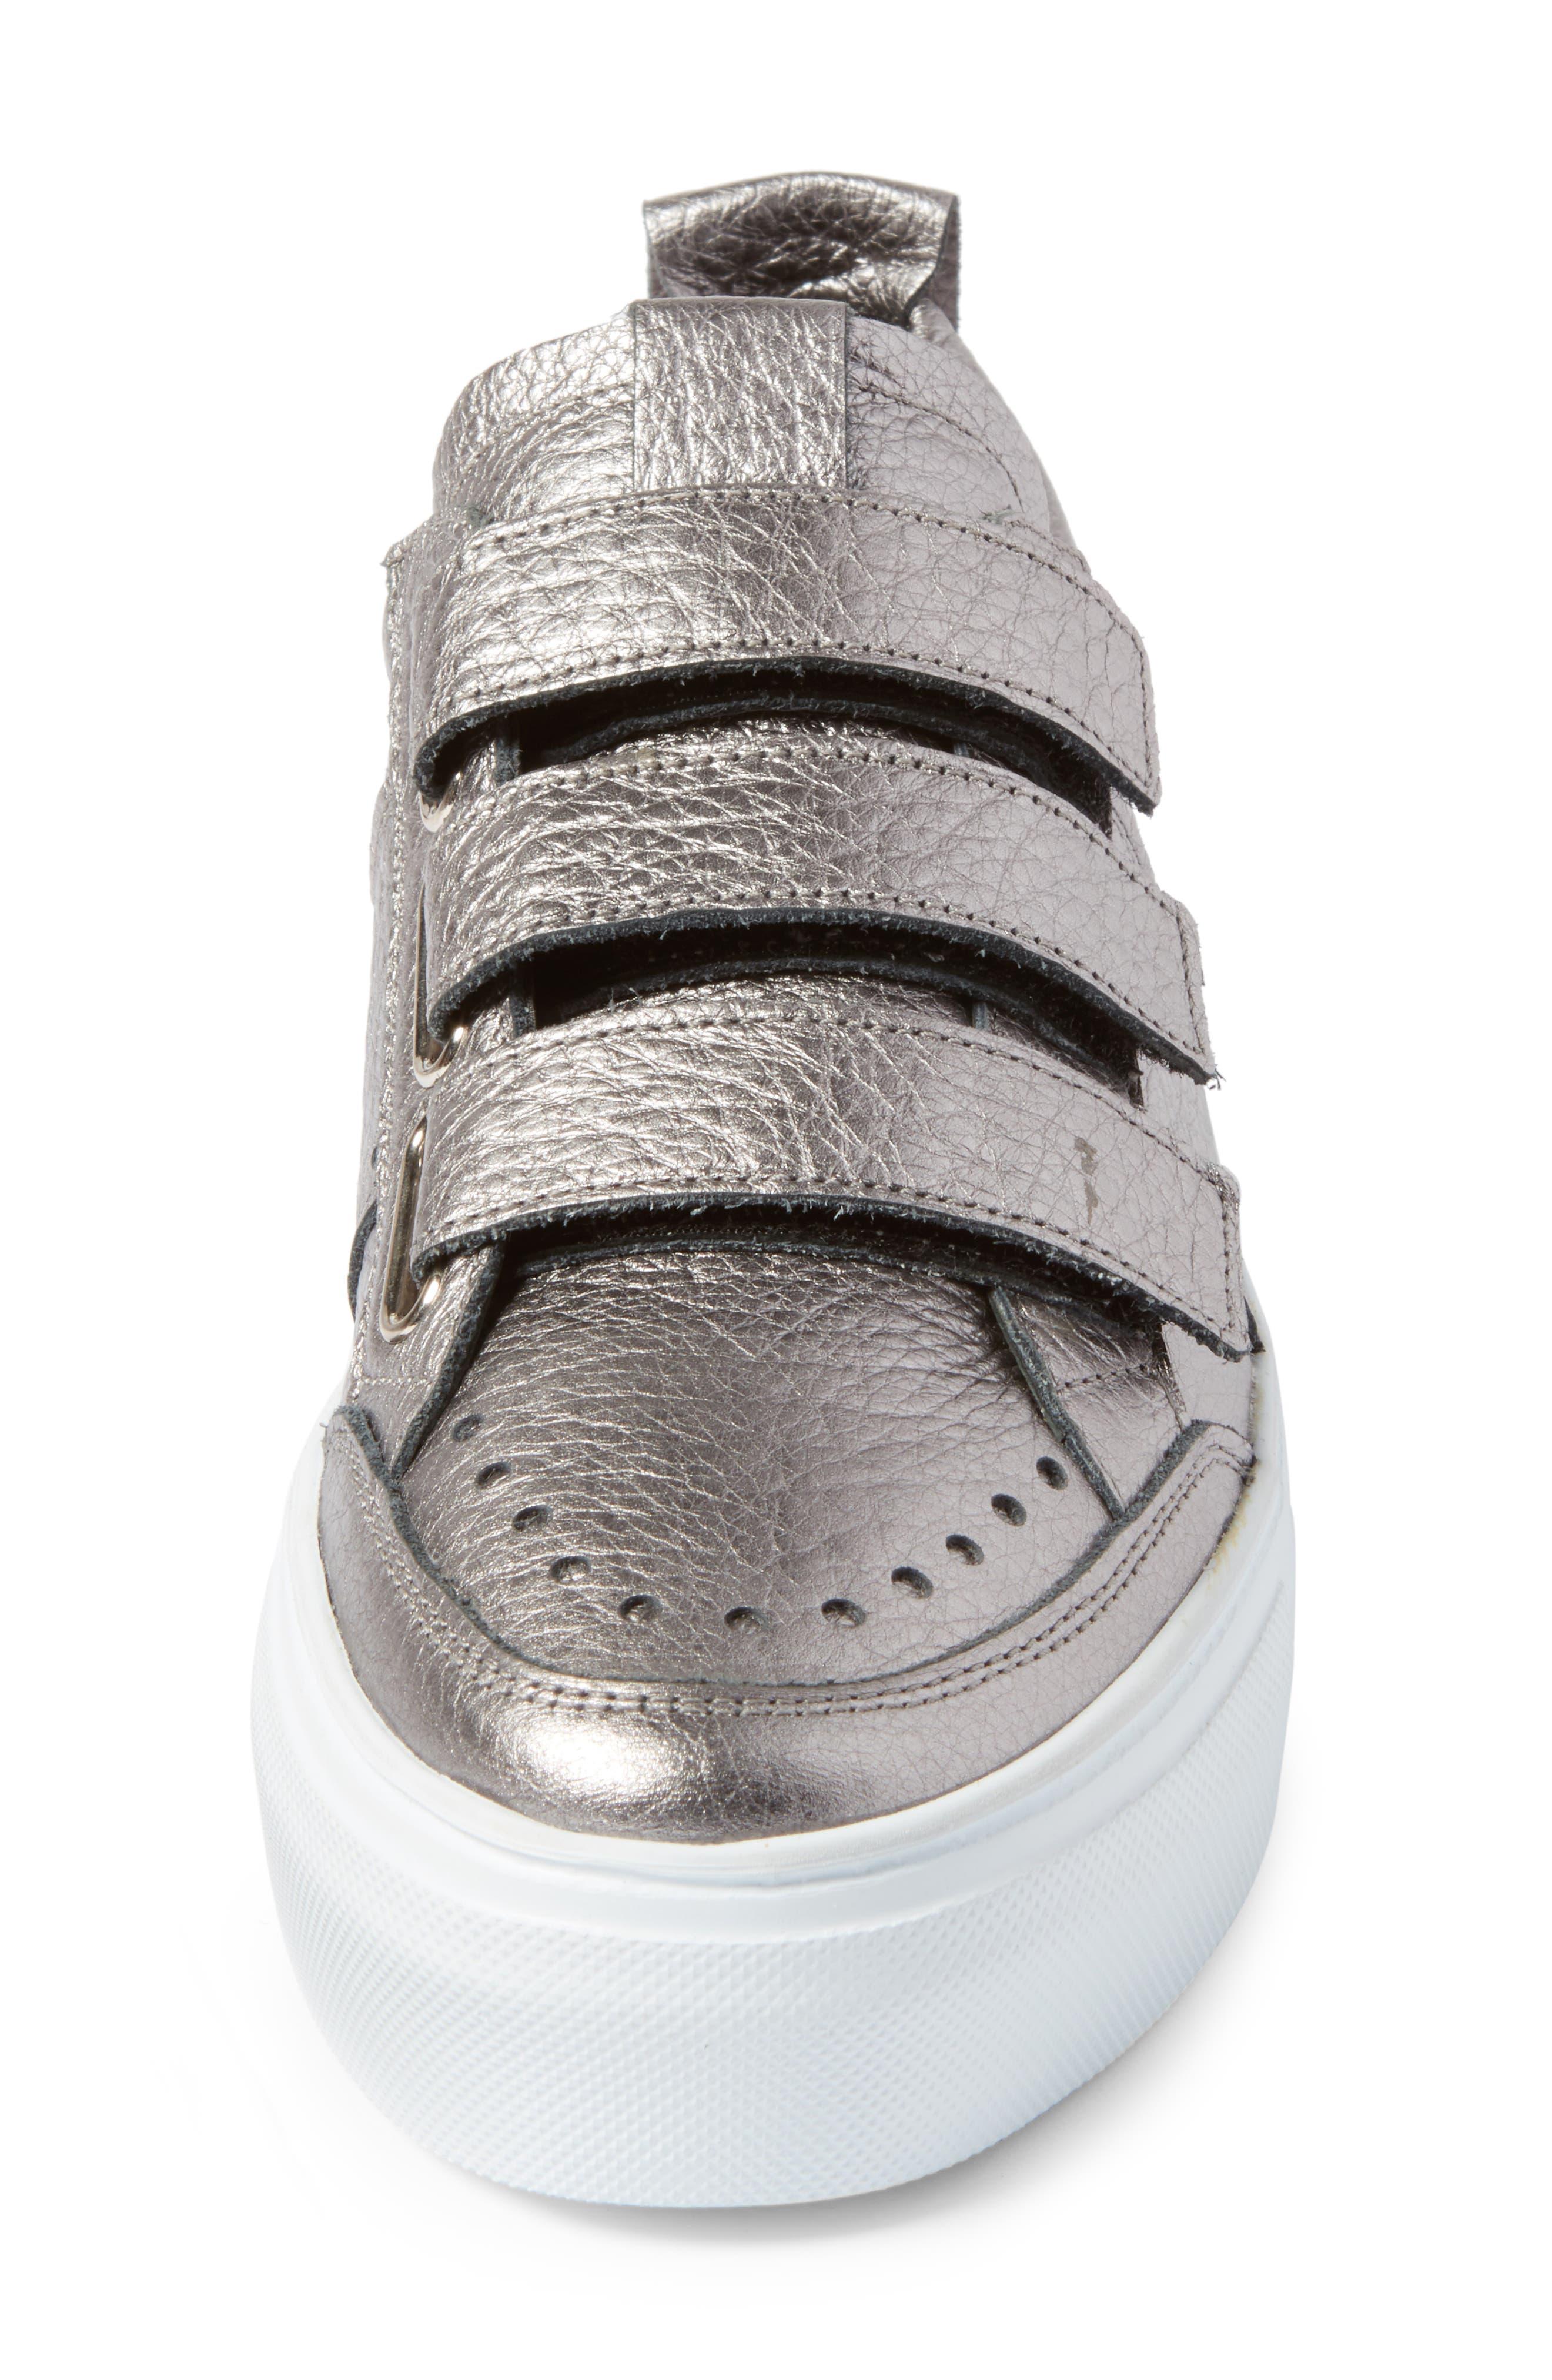 Kennel & Schmenger Big Low Top Tab Sneaker,                             Alternate thumbnail 4, color,                             020